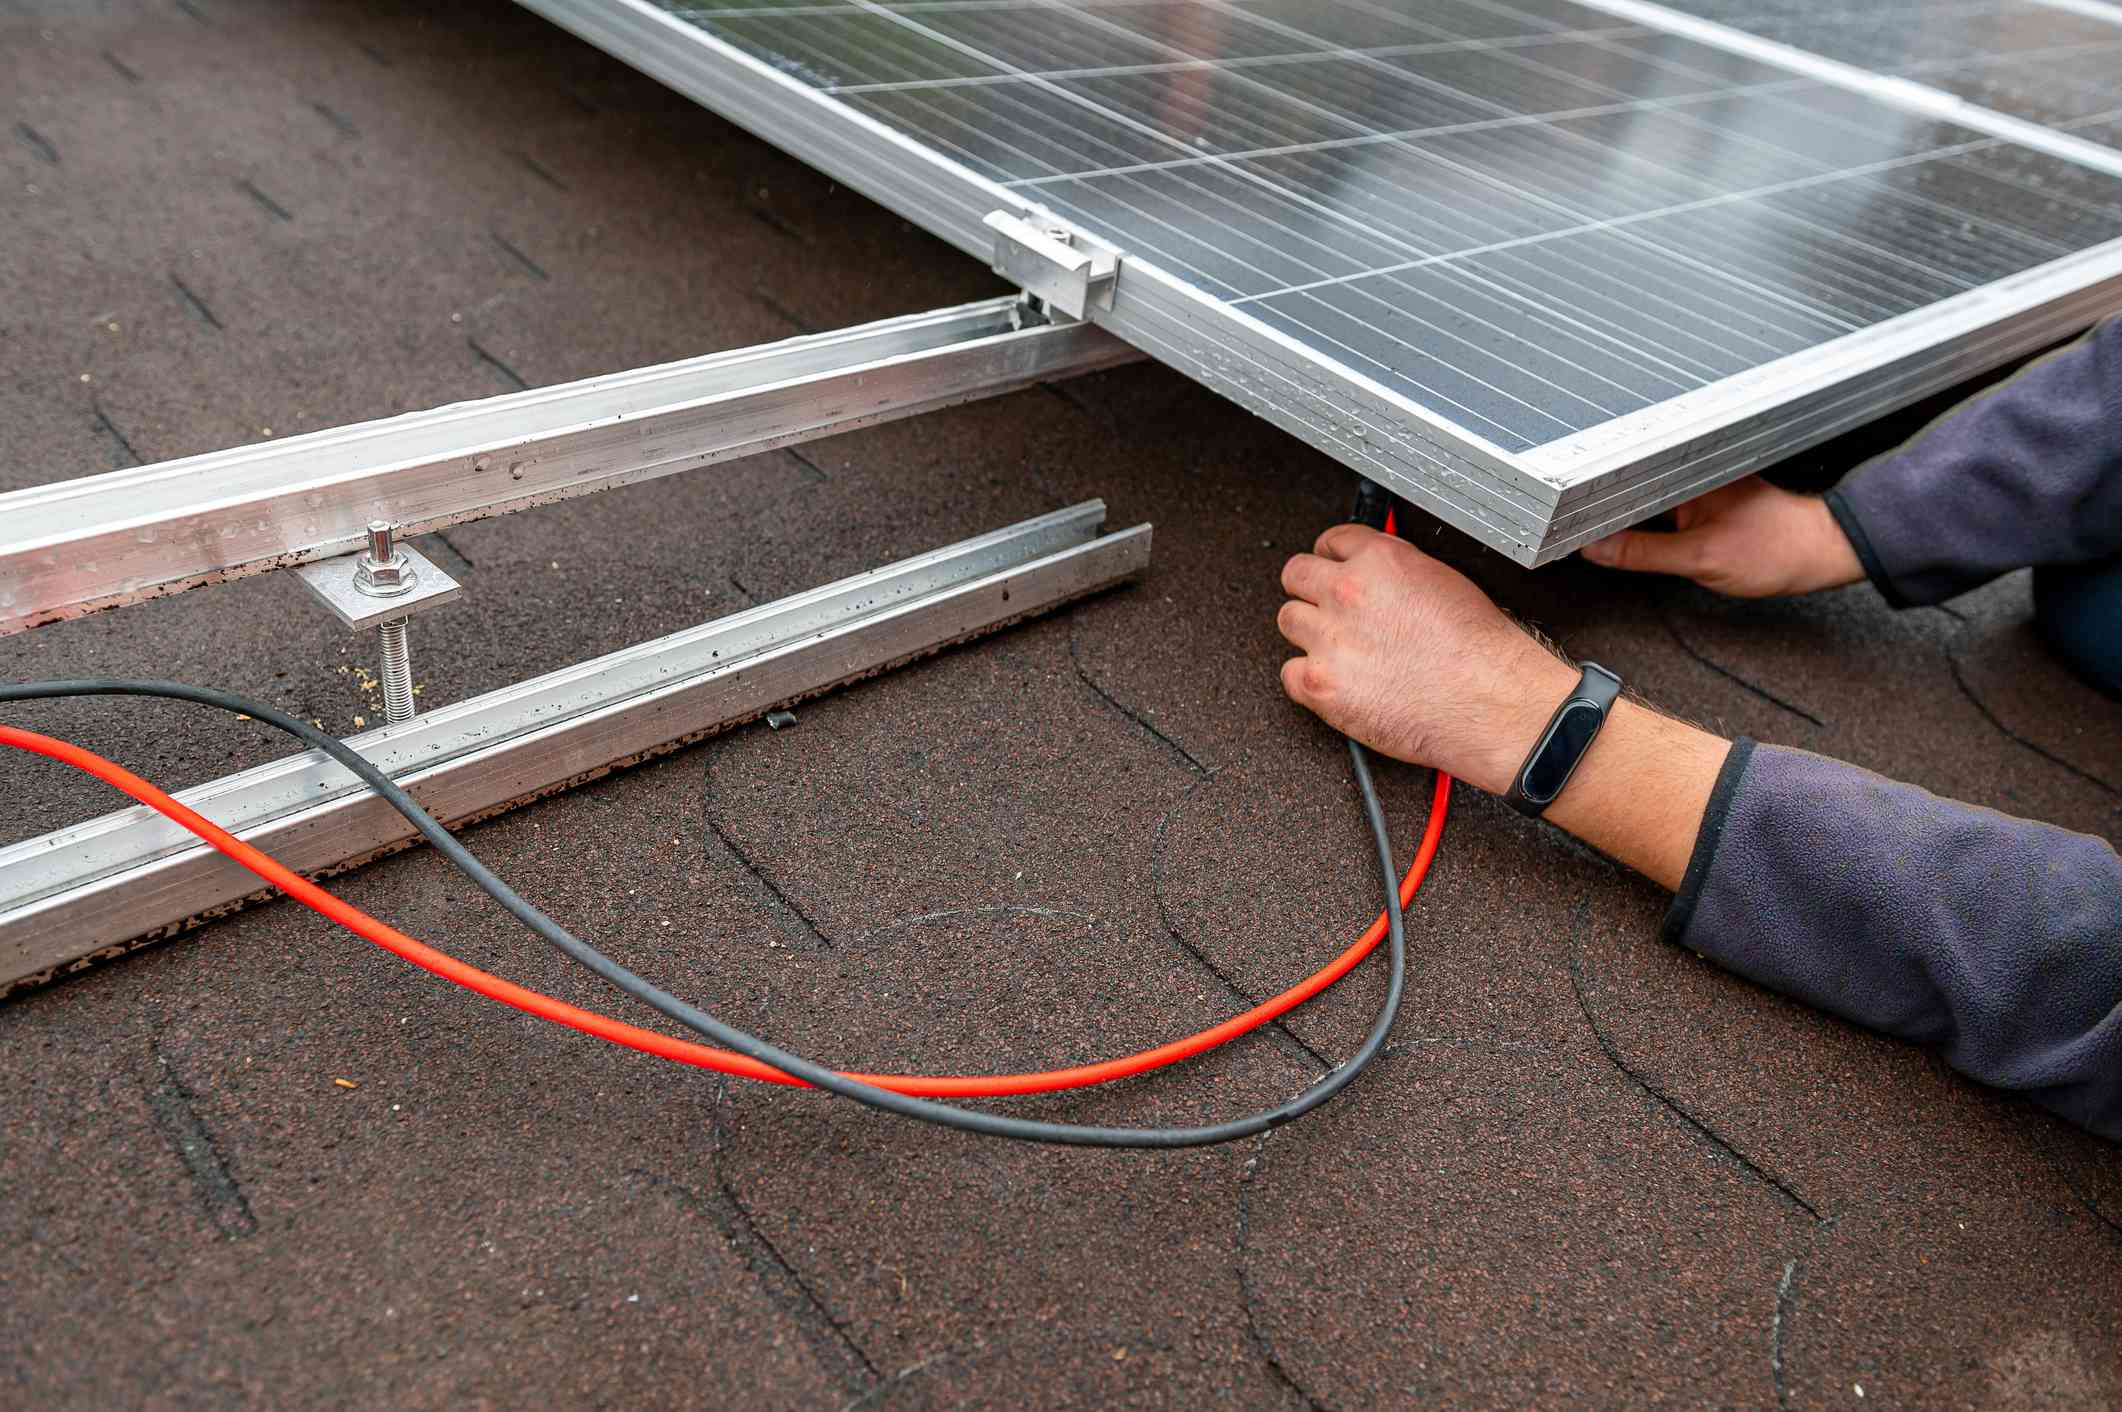 Man Installing solar panels on roof